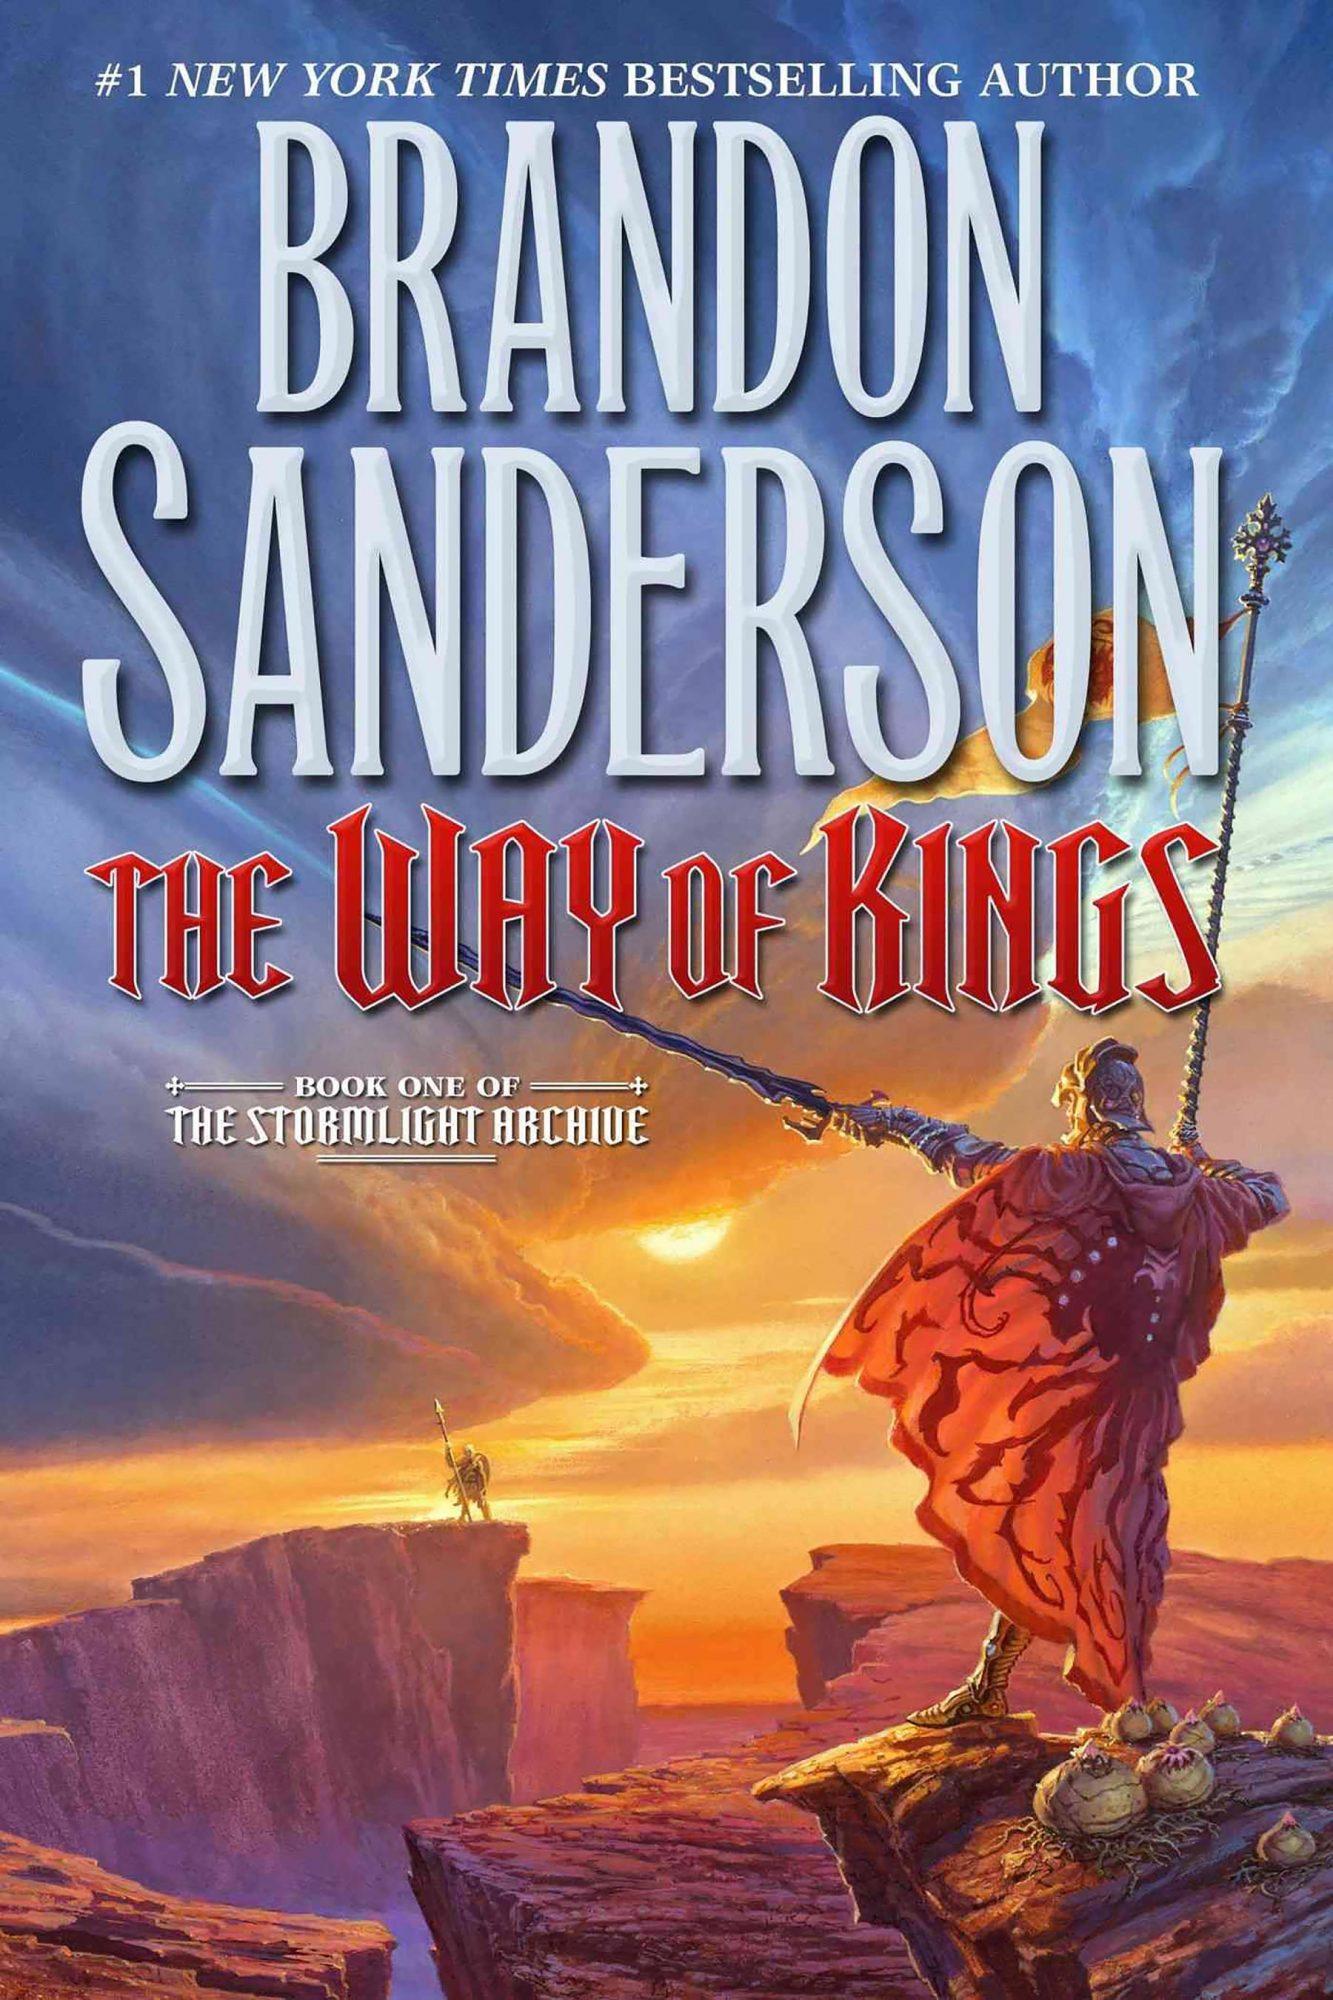 Brandon Sanderson, The Way of Kings